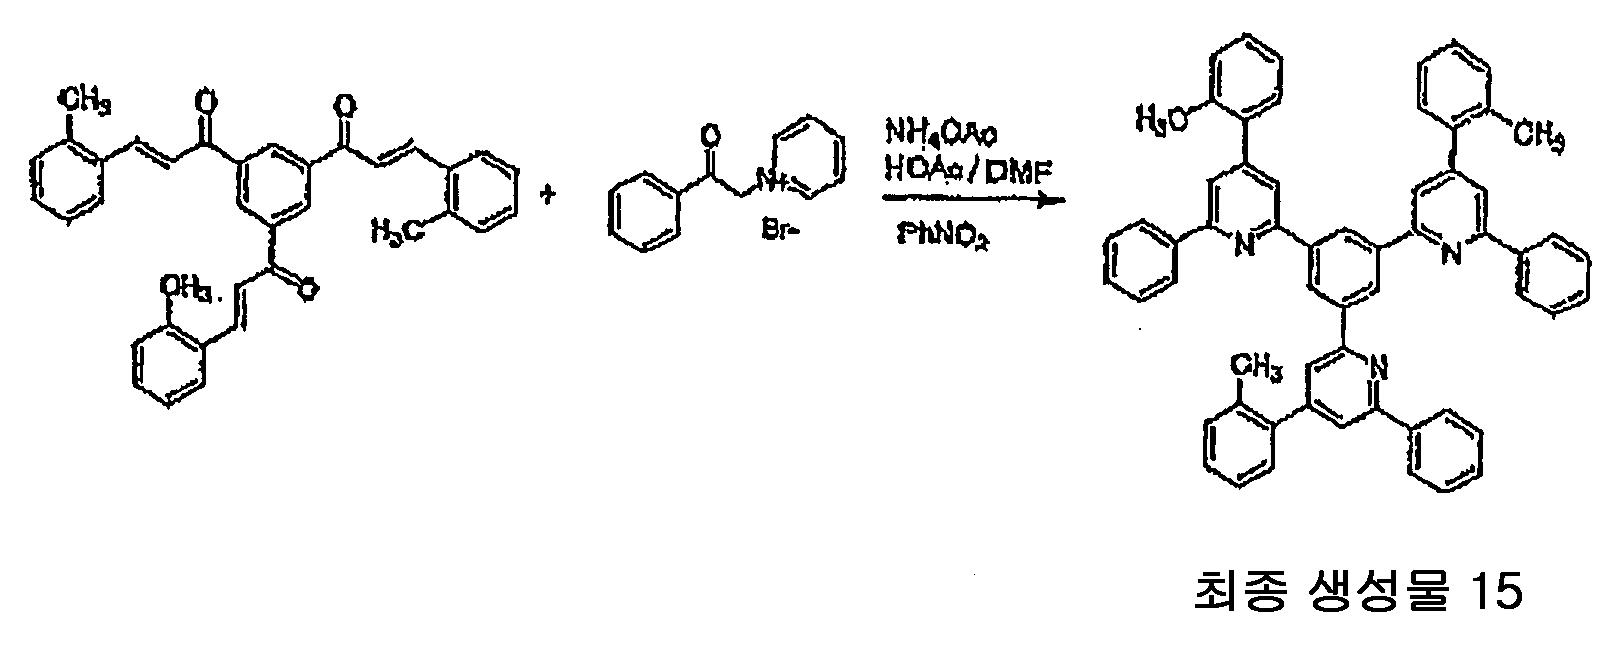 Figure 112010002231902-pat00111